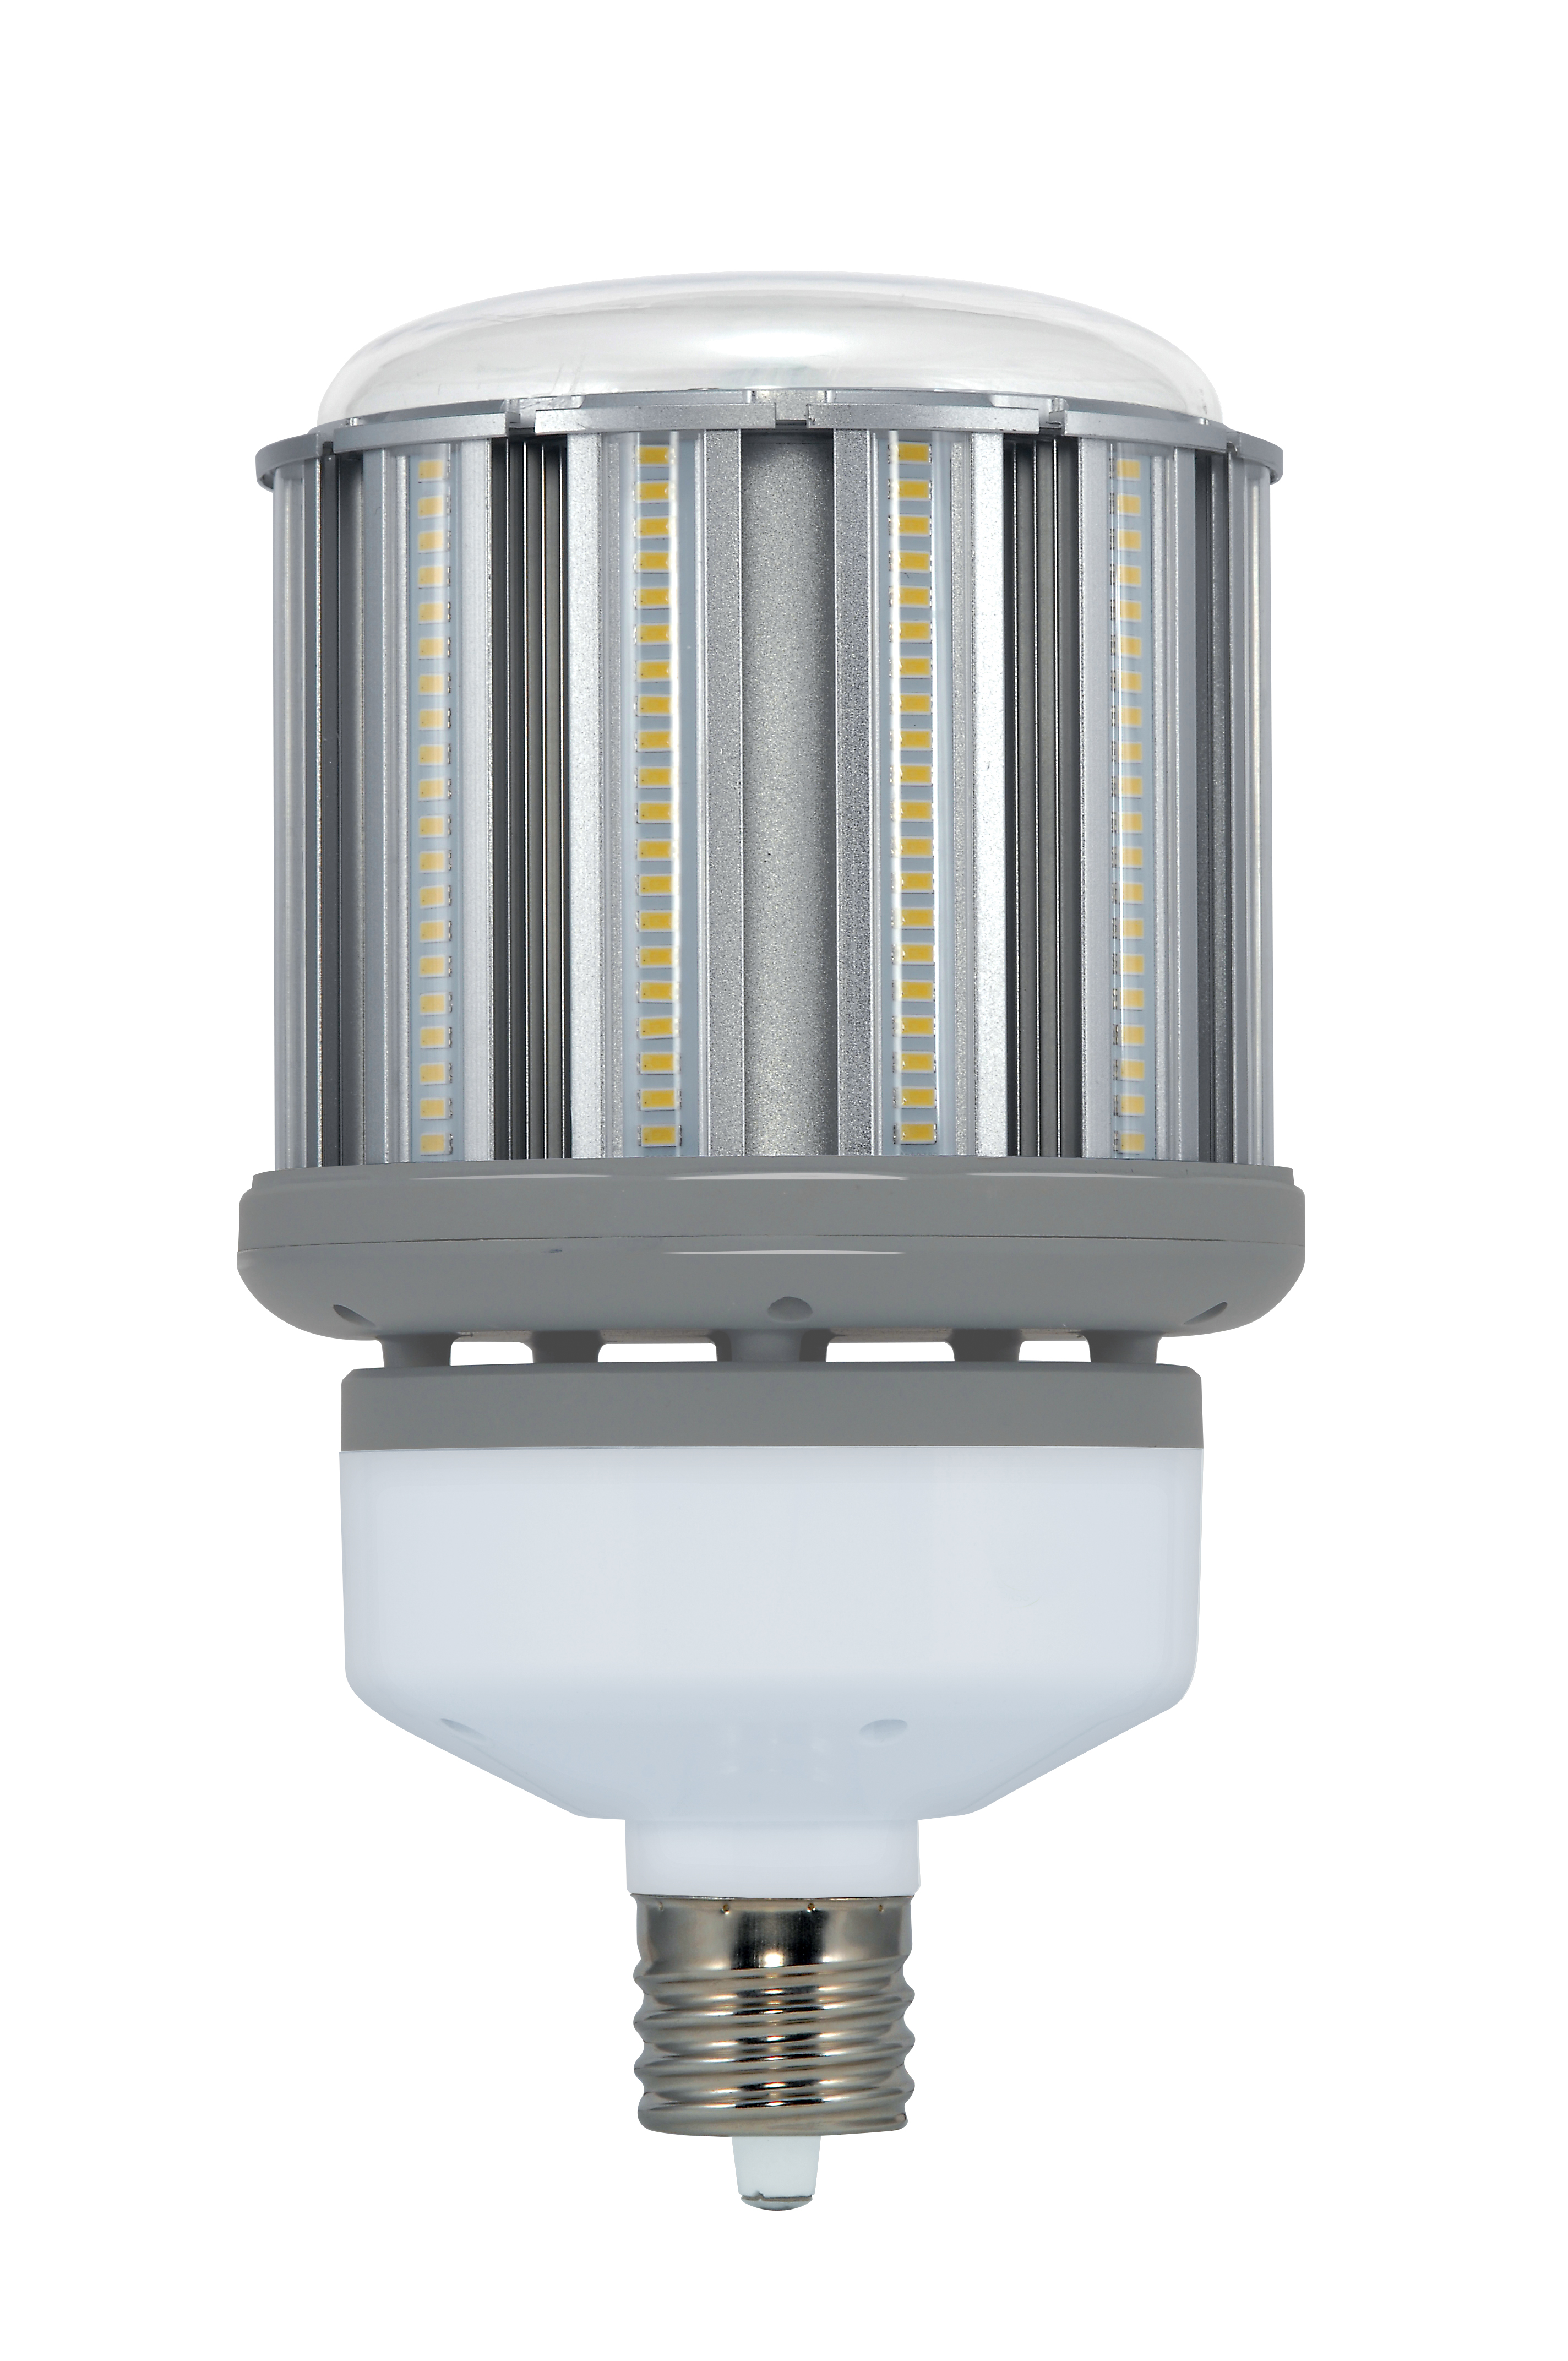 Satco,S9396,SATCO® Hi-Pro Non-Dimmable LED Retrofit, LED Lamp, 100 to 277 VAC